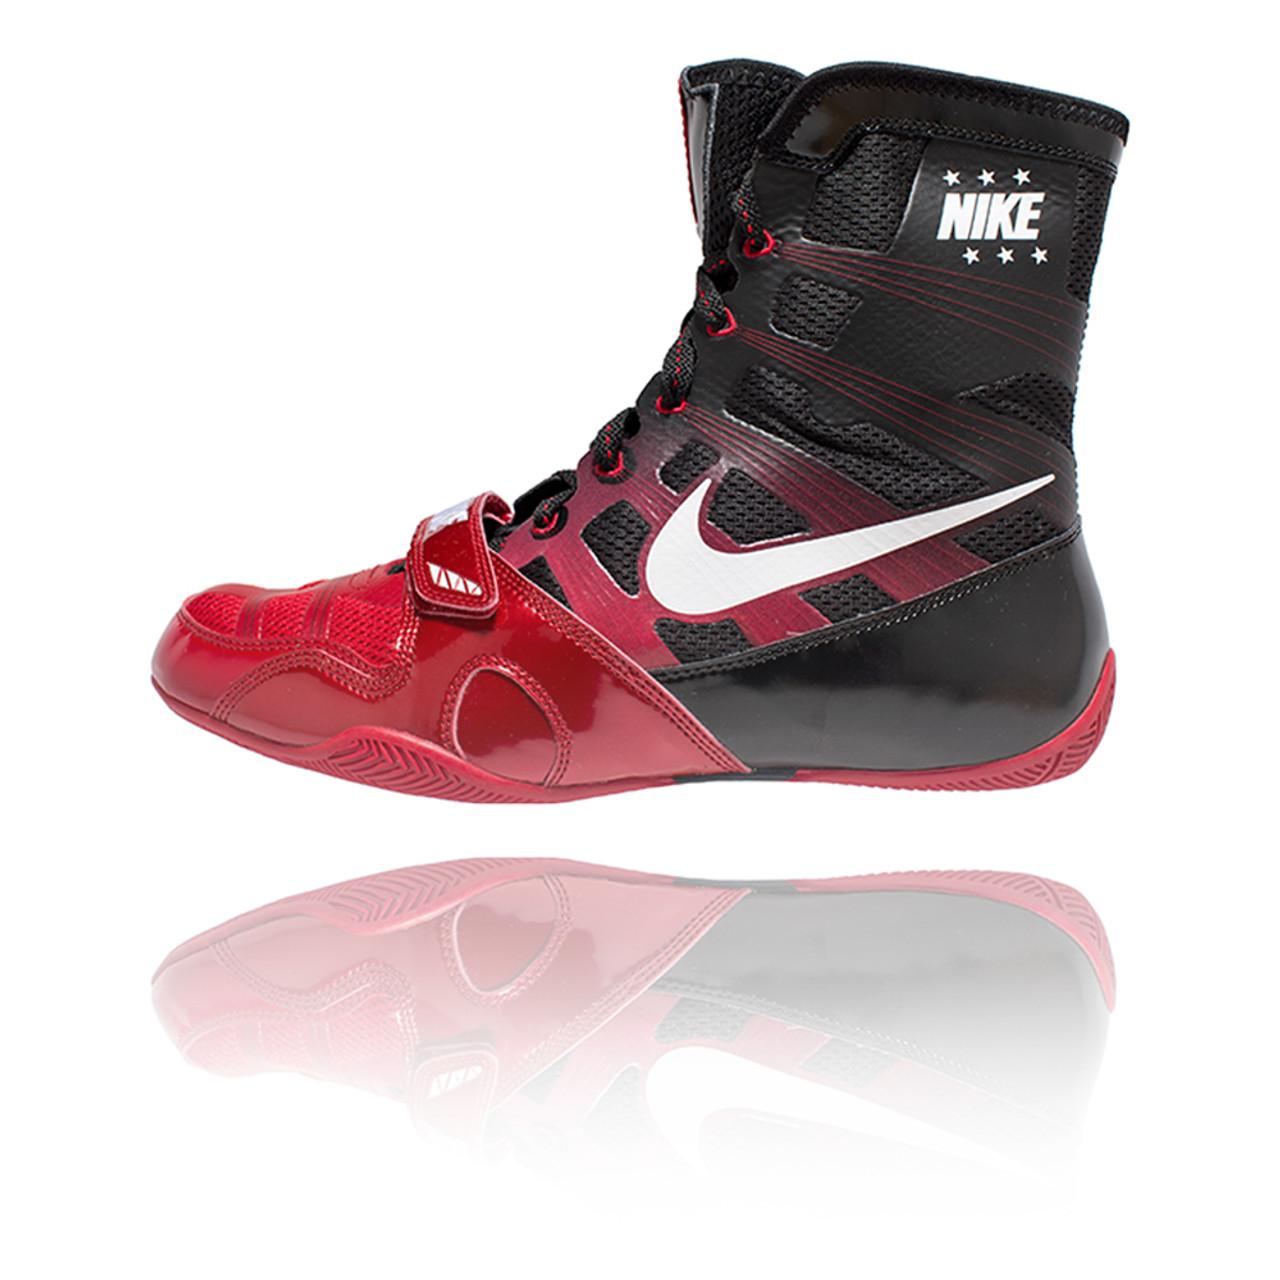 Nike HyperKO - Gym Red / White / Black